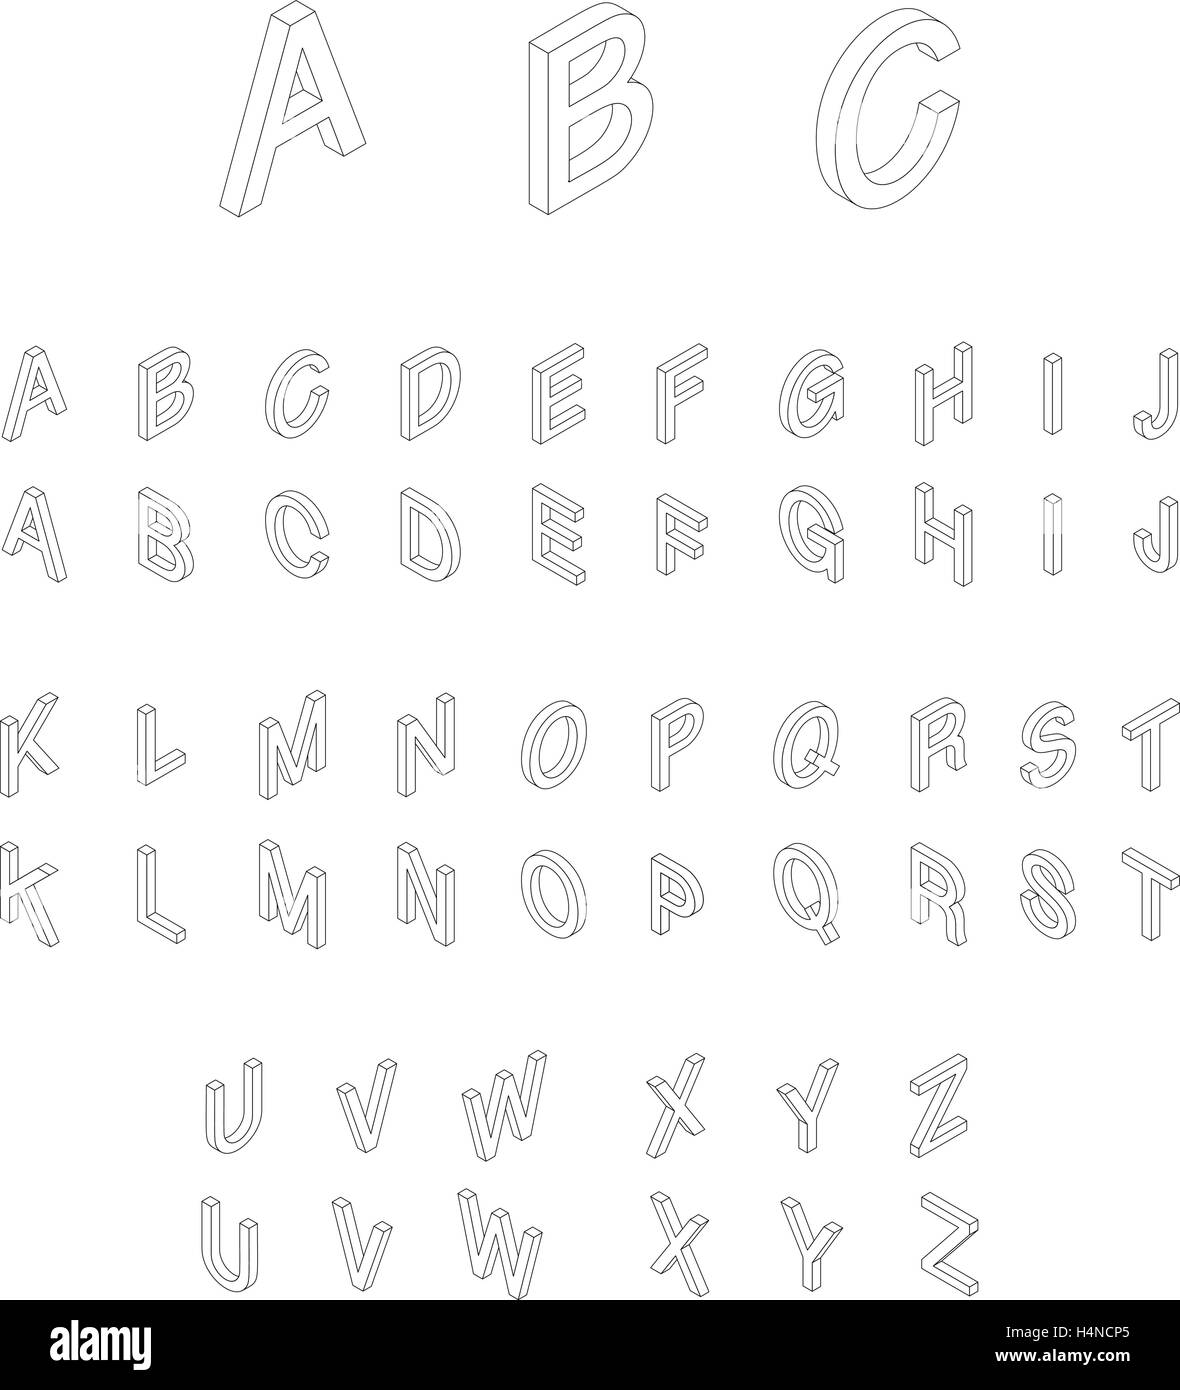 Isometric Alphabet Font Stock Vector Art Amp Illustration